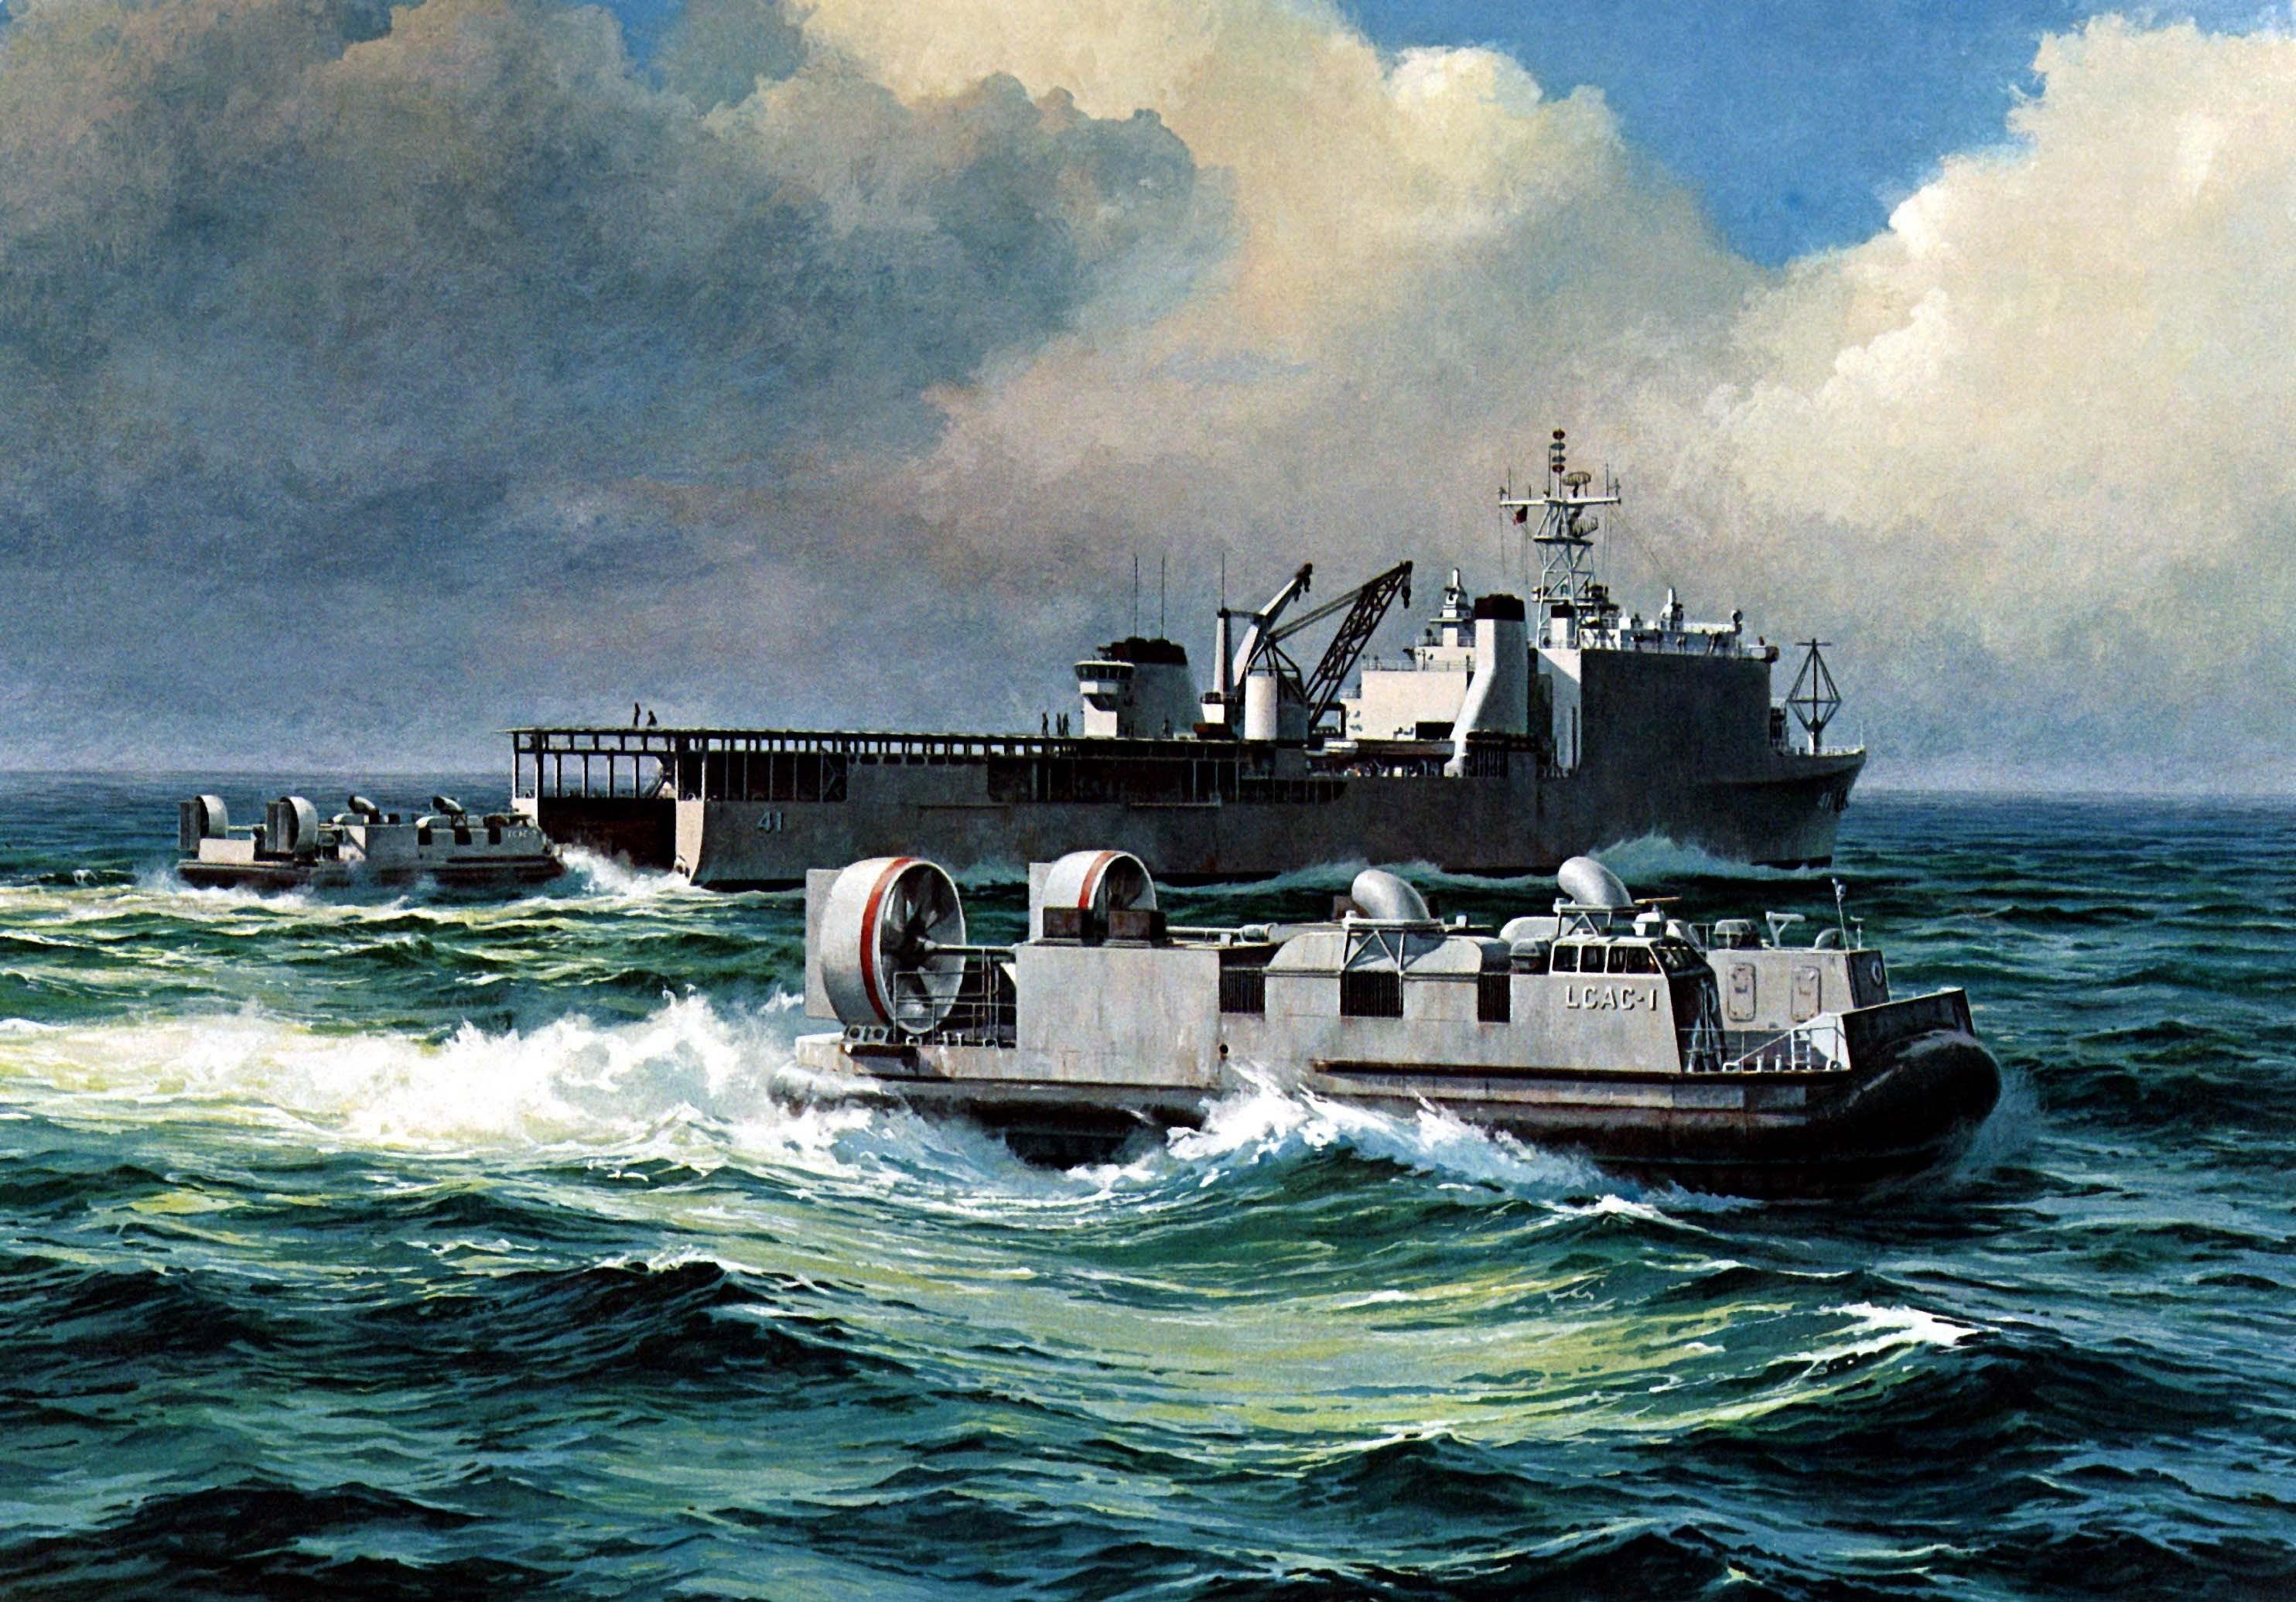 HQ Definition Wallpaper Desktop united states navy picture, Edin Black  2017-03-05